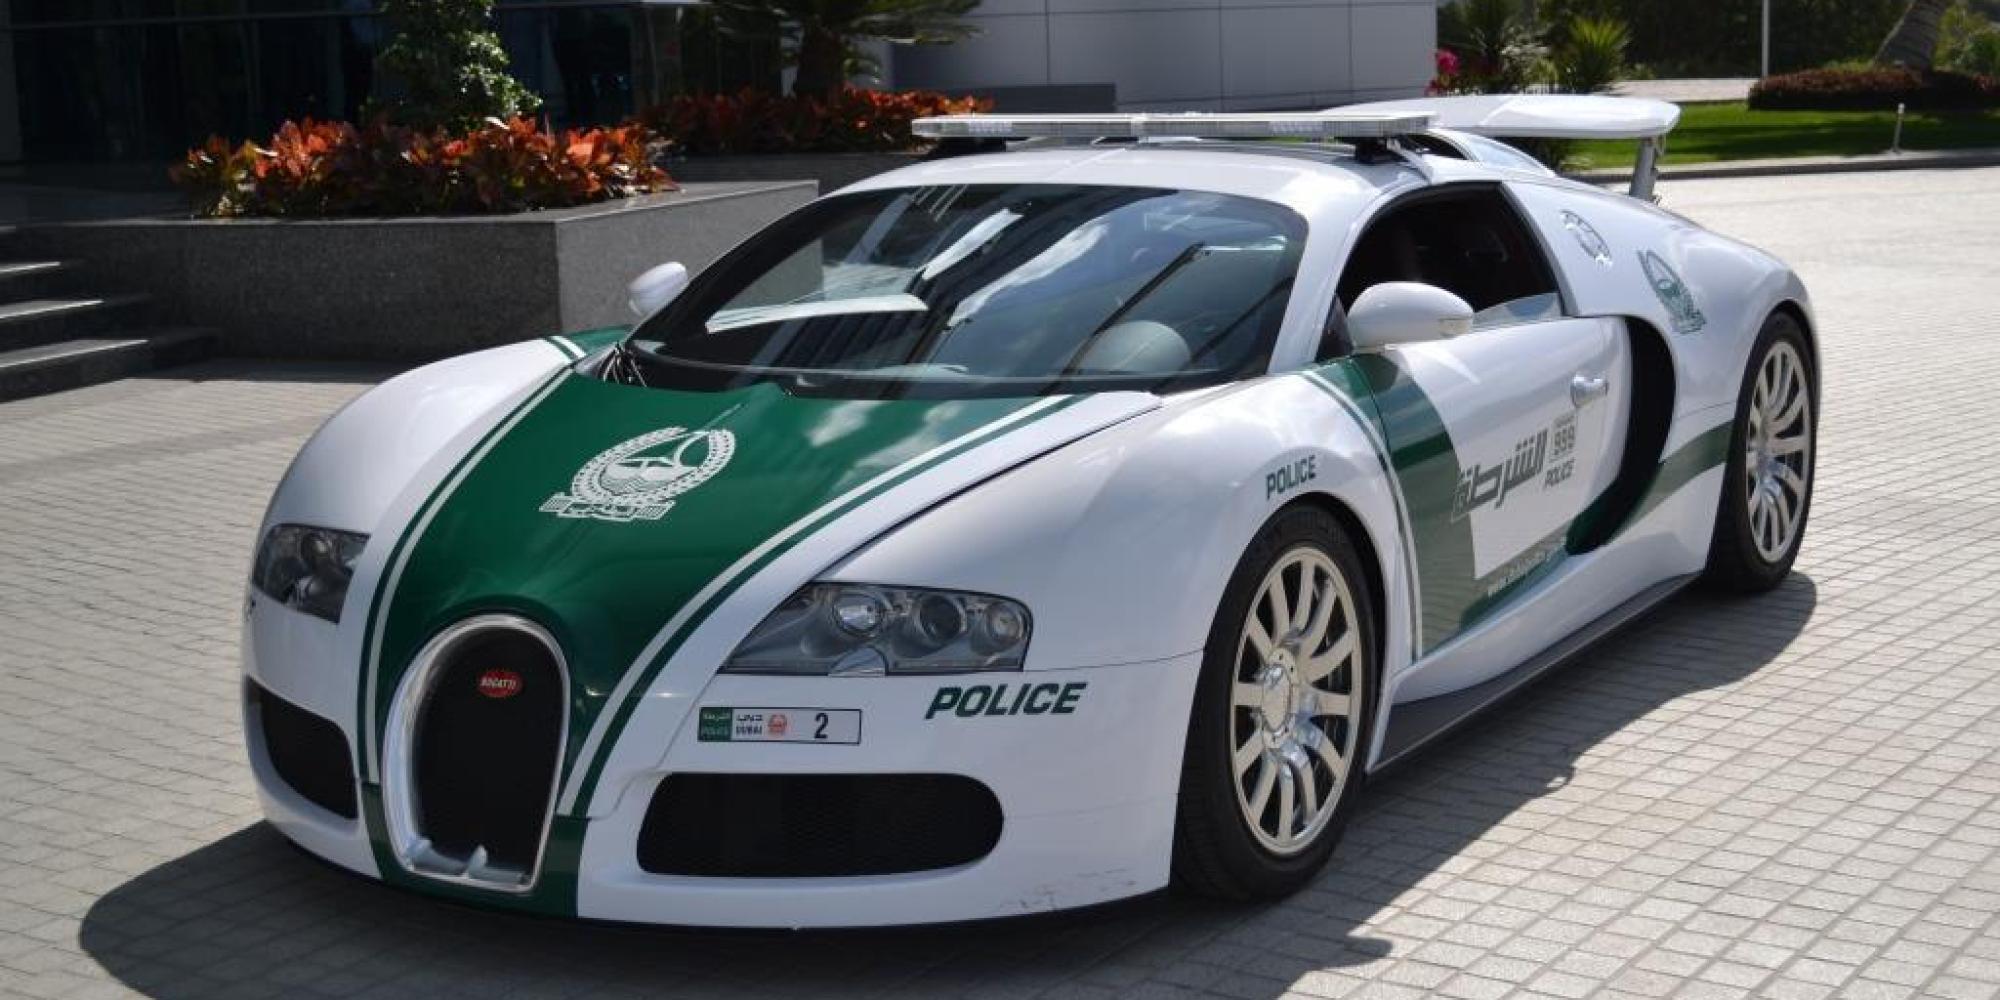 Best of police cars - Dubai Police Supercars Bugatti Veyron